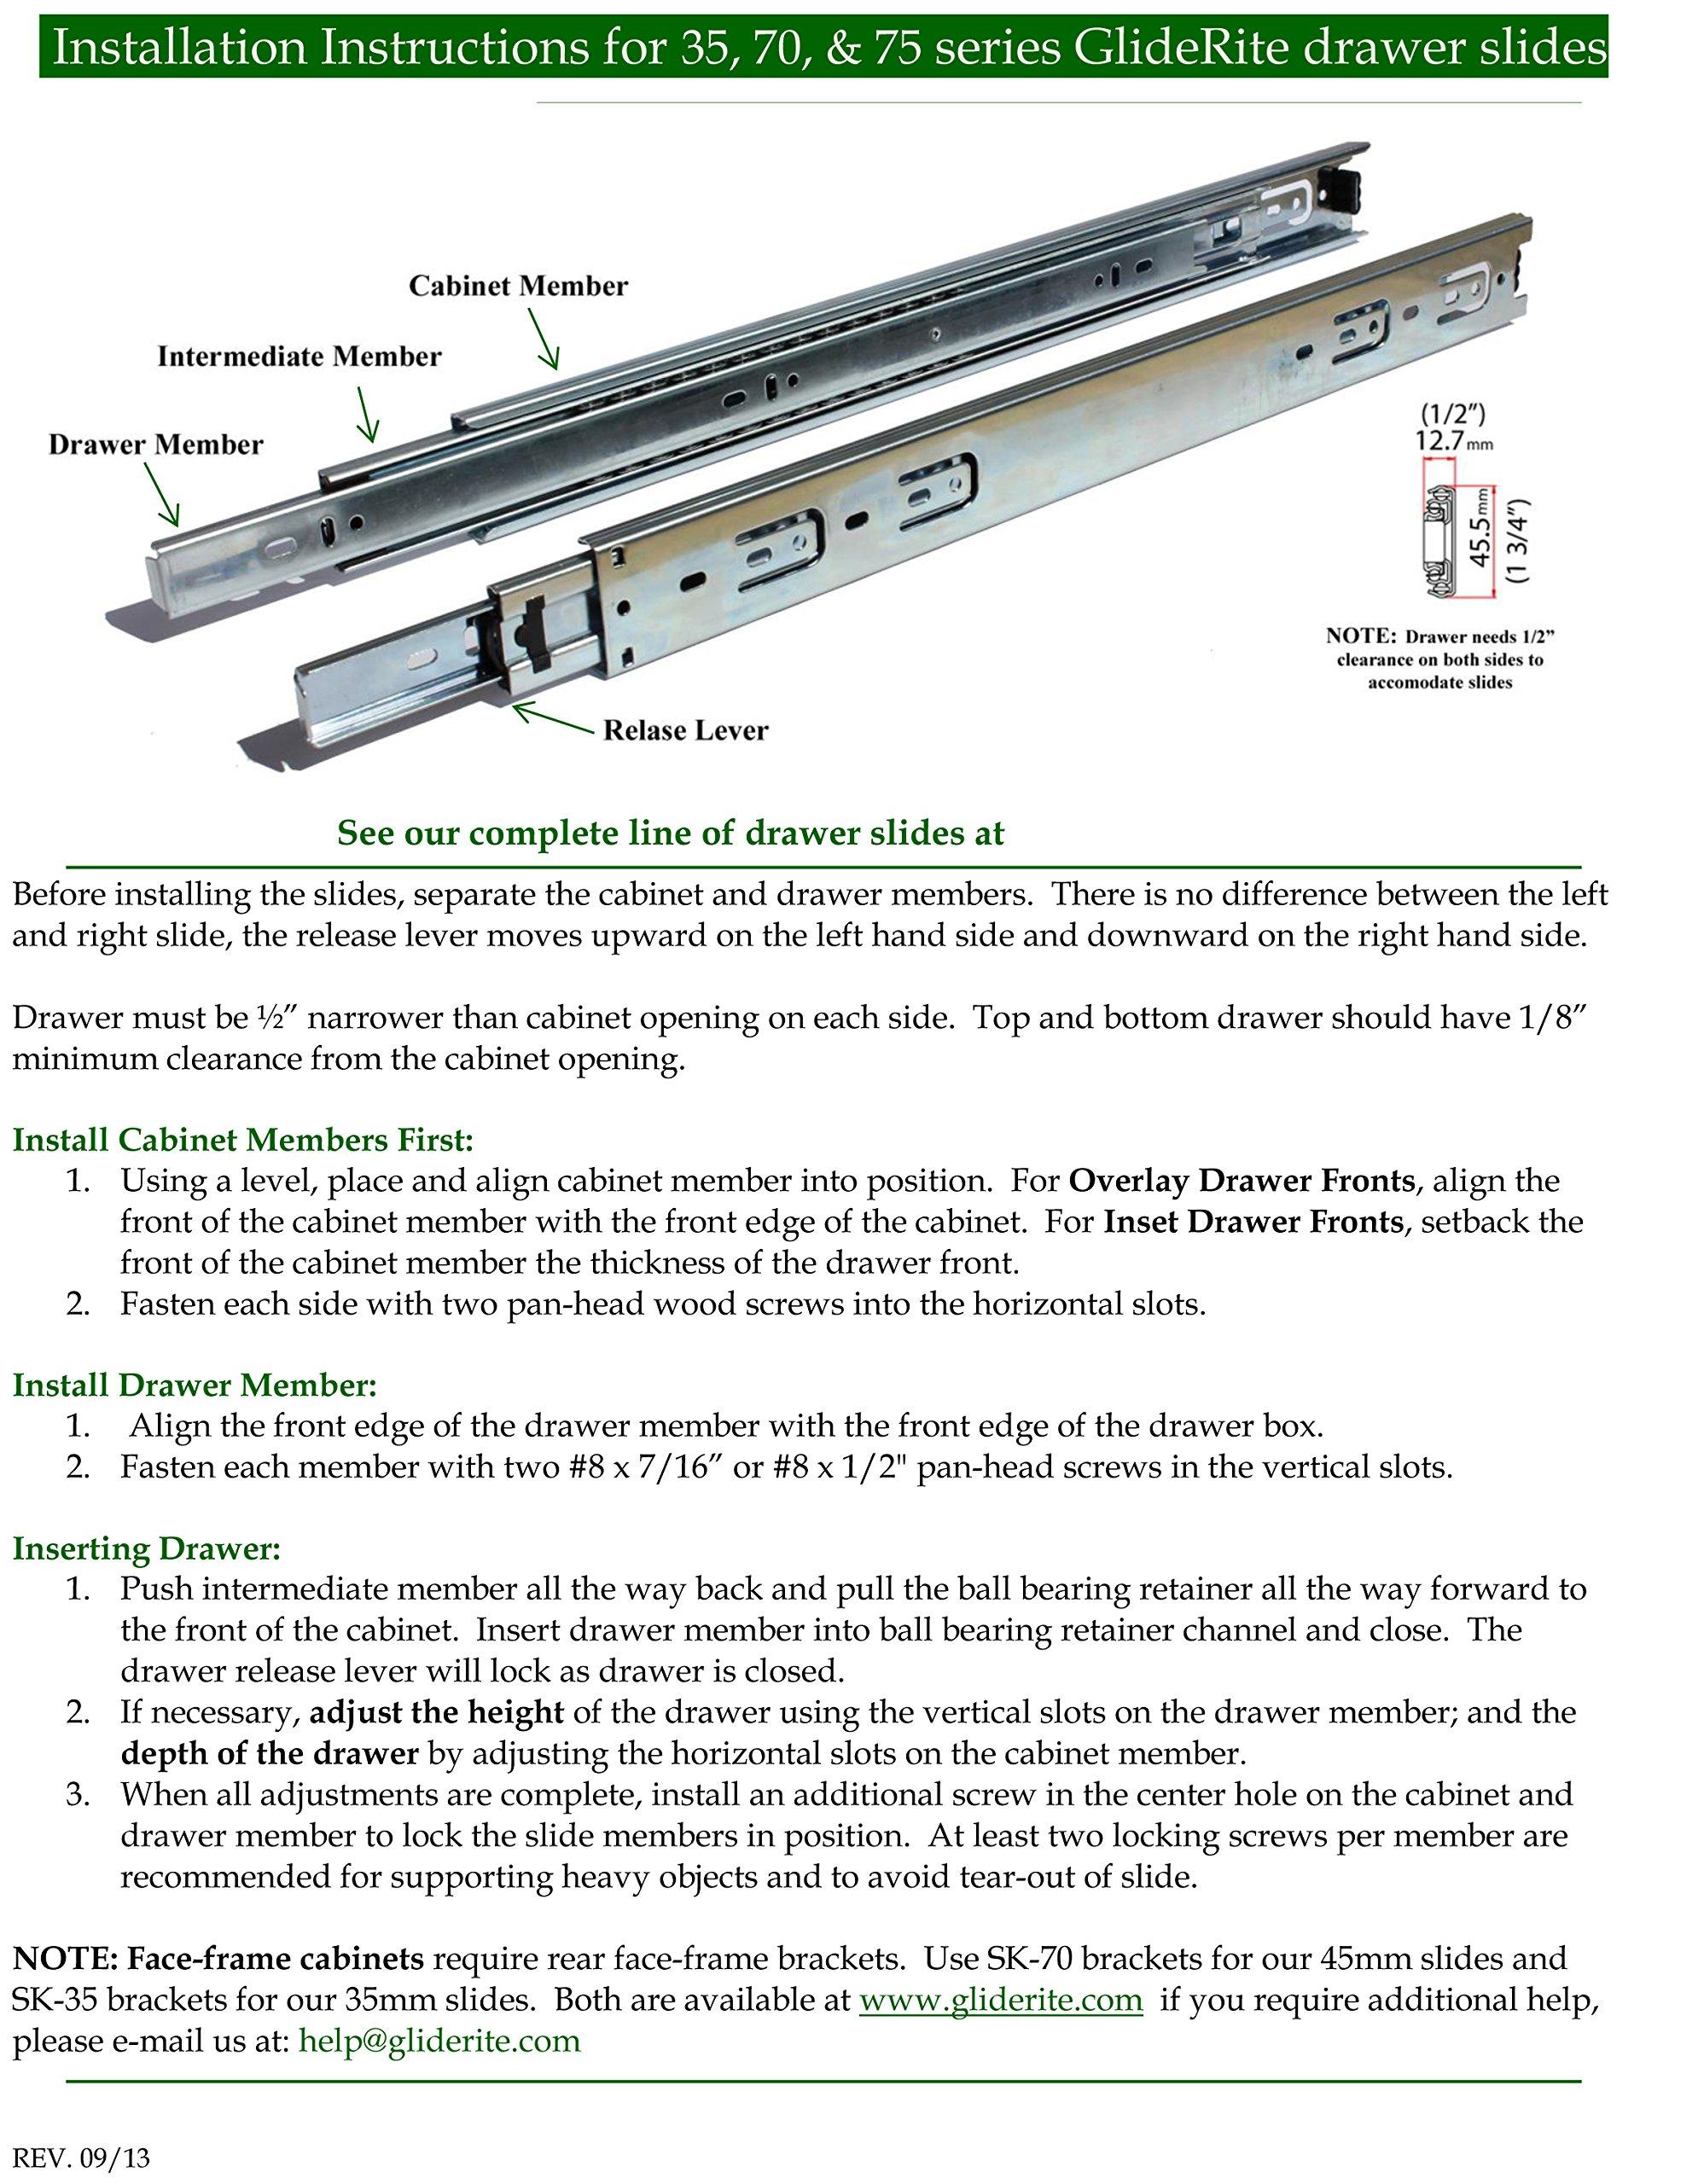 GlideRite Hardware 4058-PC-100 4 inch steel Door Hinges 0.625 inch Radius Polished Chrome Finish 100 Pack by GlideRite Hardware (Image #5)